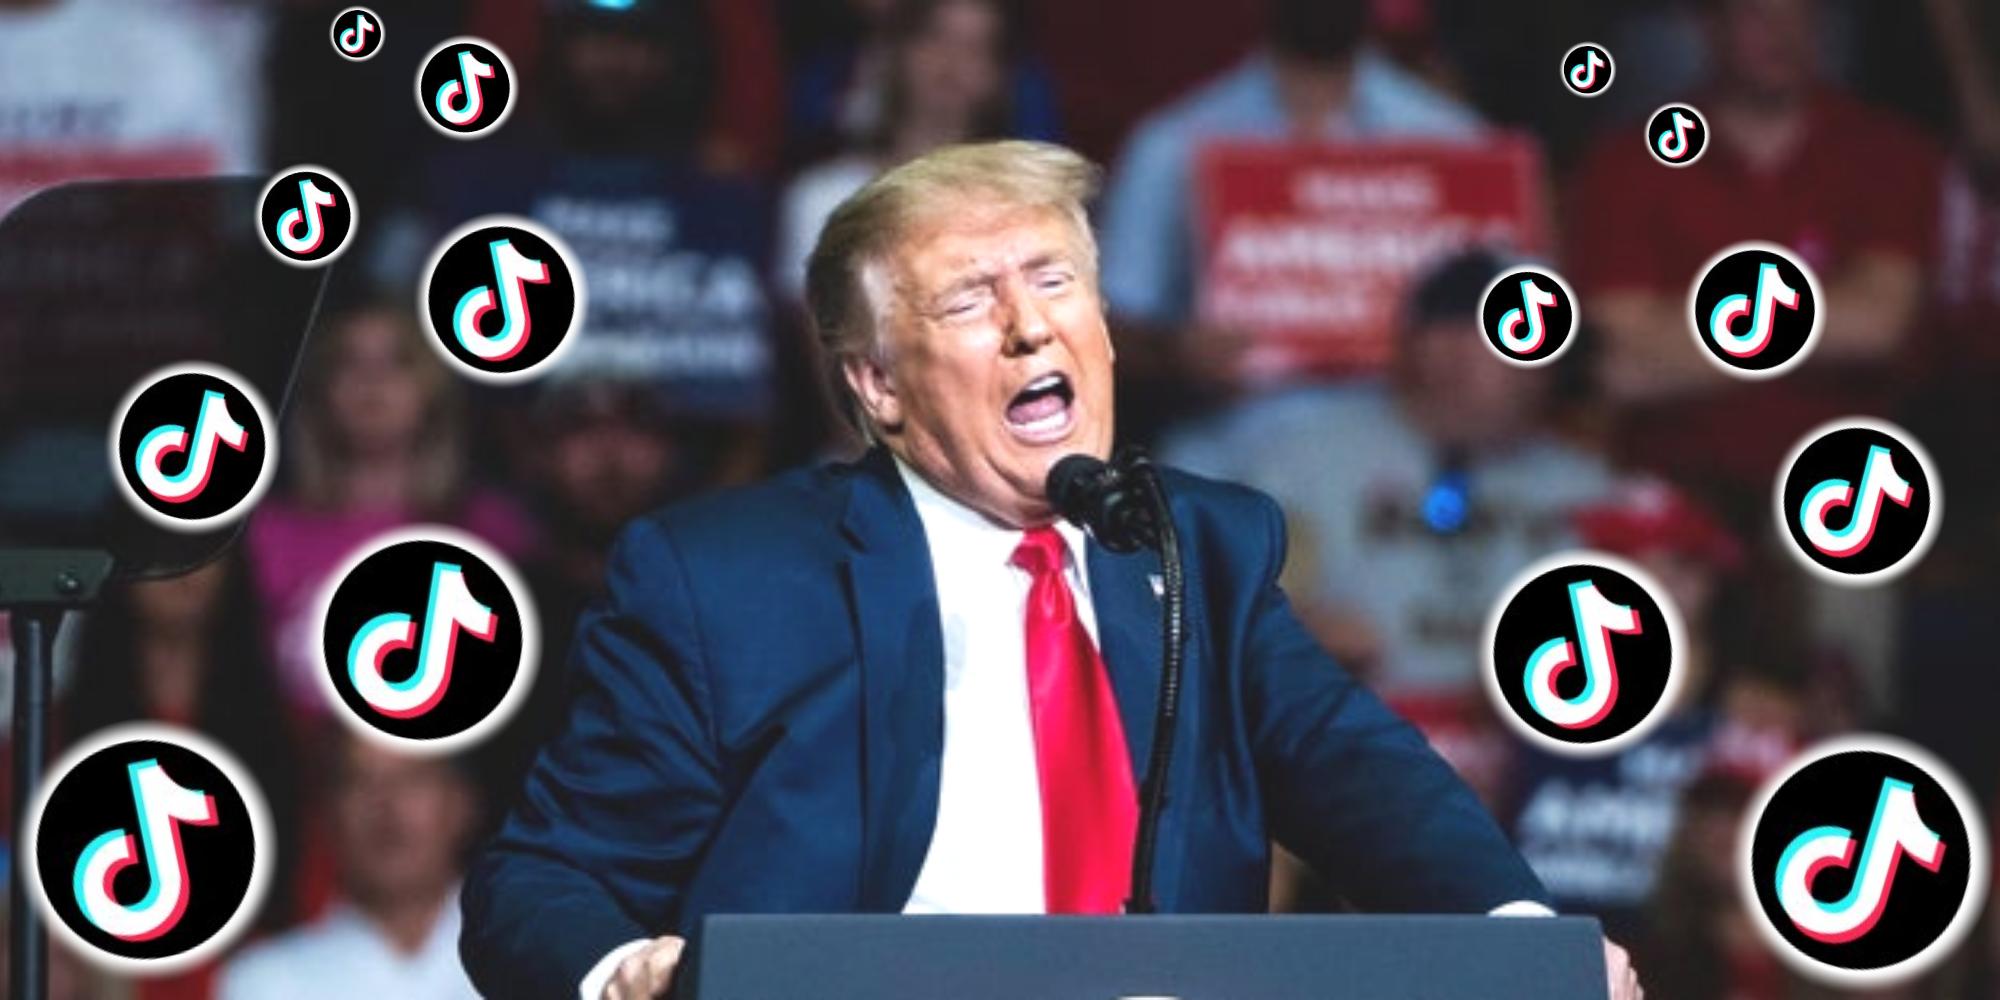 Trump Tiktok